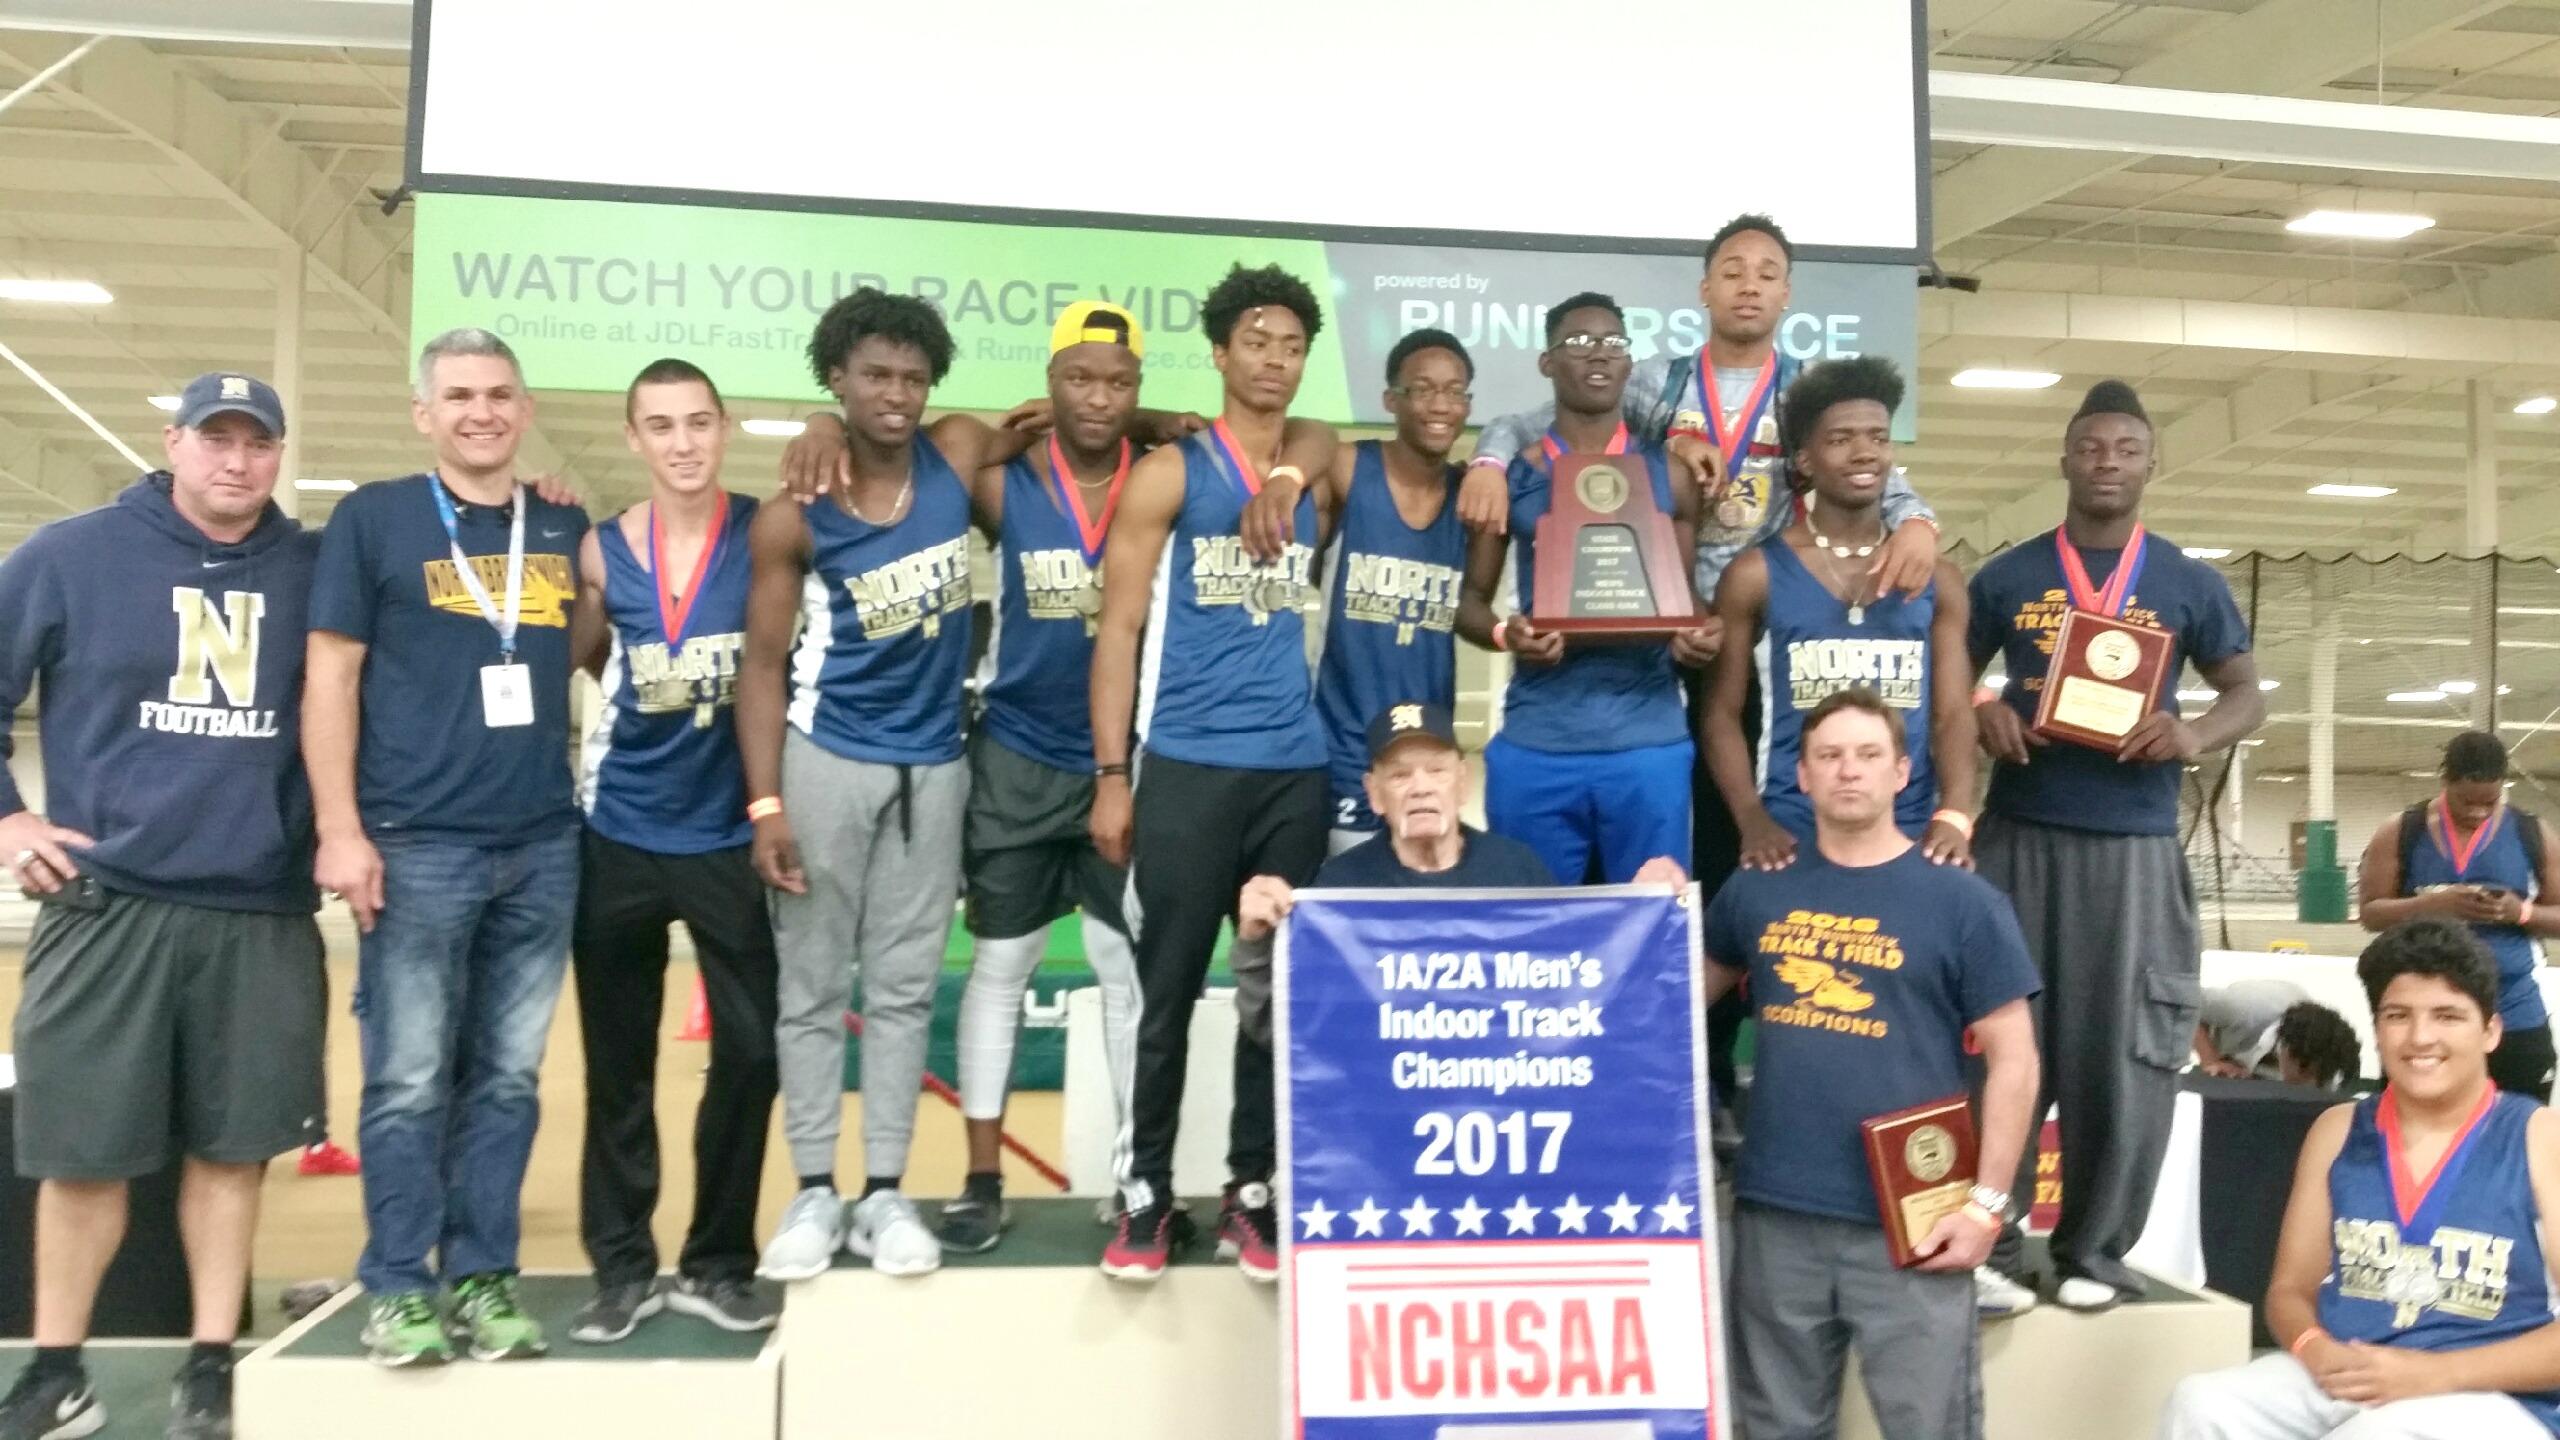 North Brunswick High School Track Team